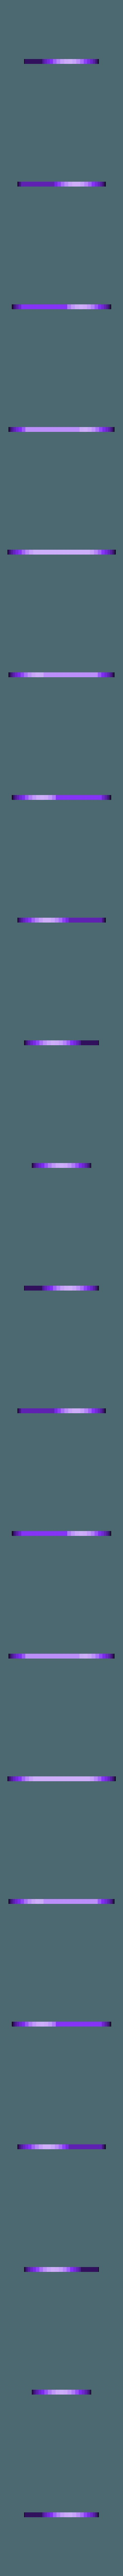 anneau_blanc.STL Download STL file Square signal Purple • Object to 3D print, dede34500